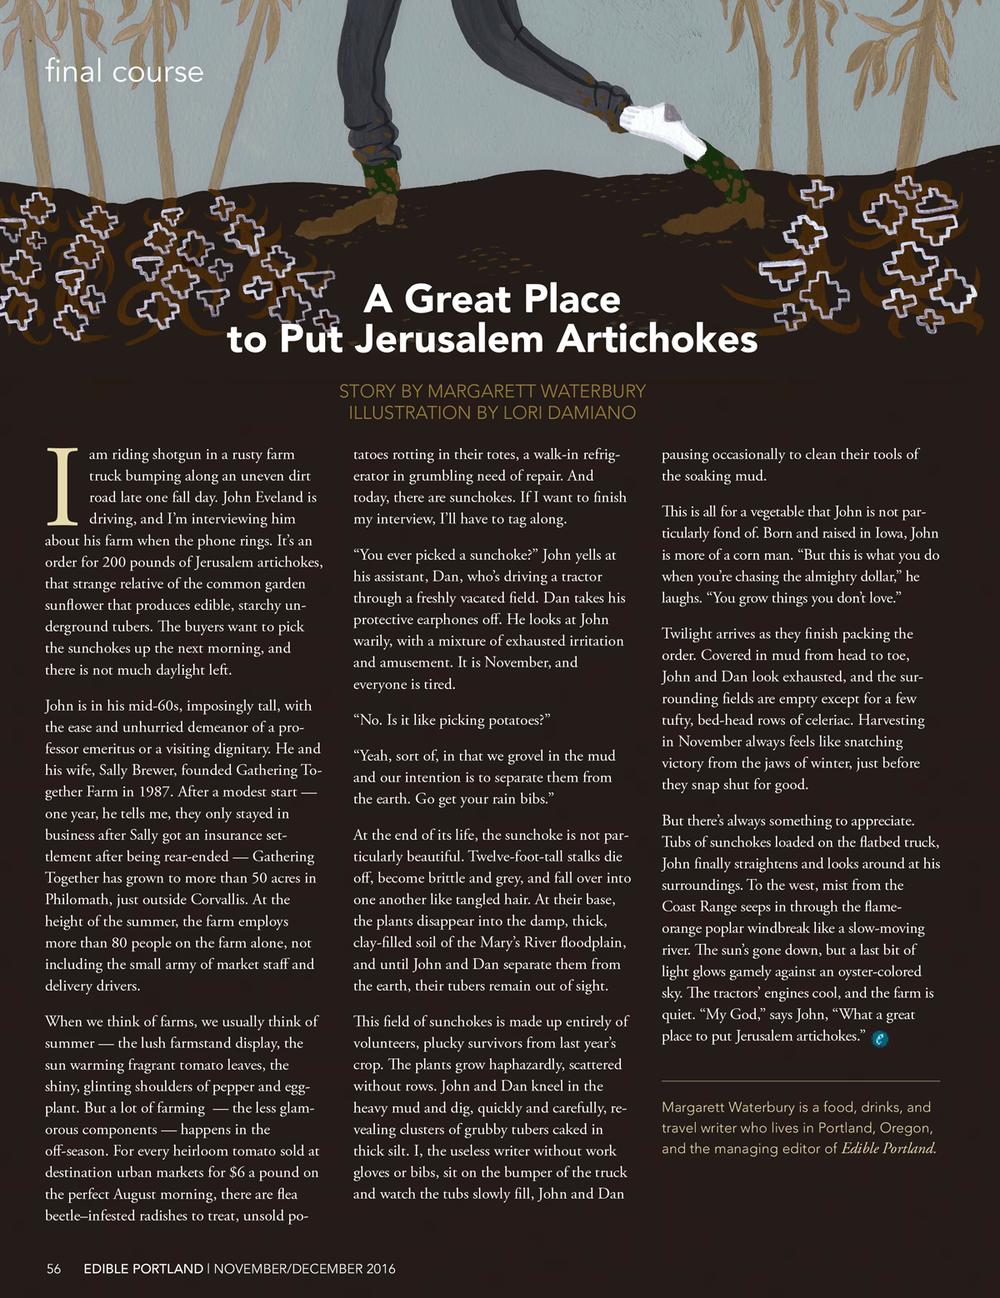 Jerusalem artichokesSM.png